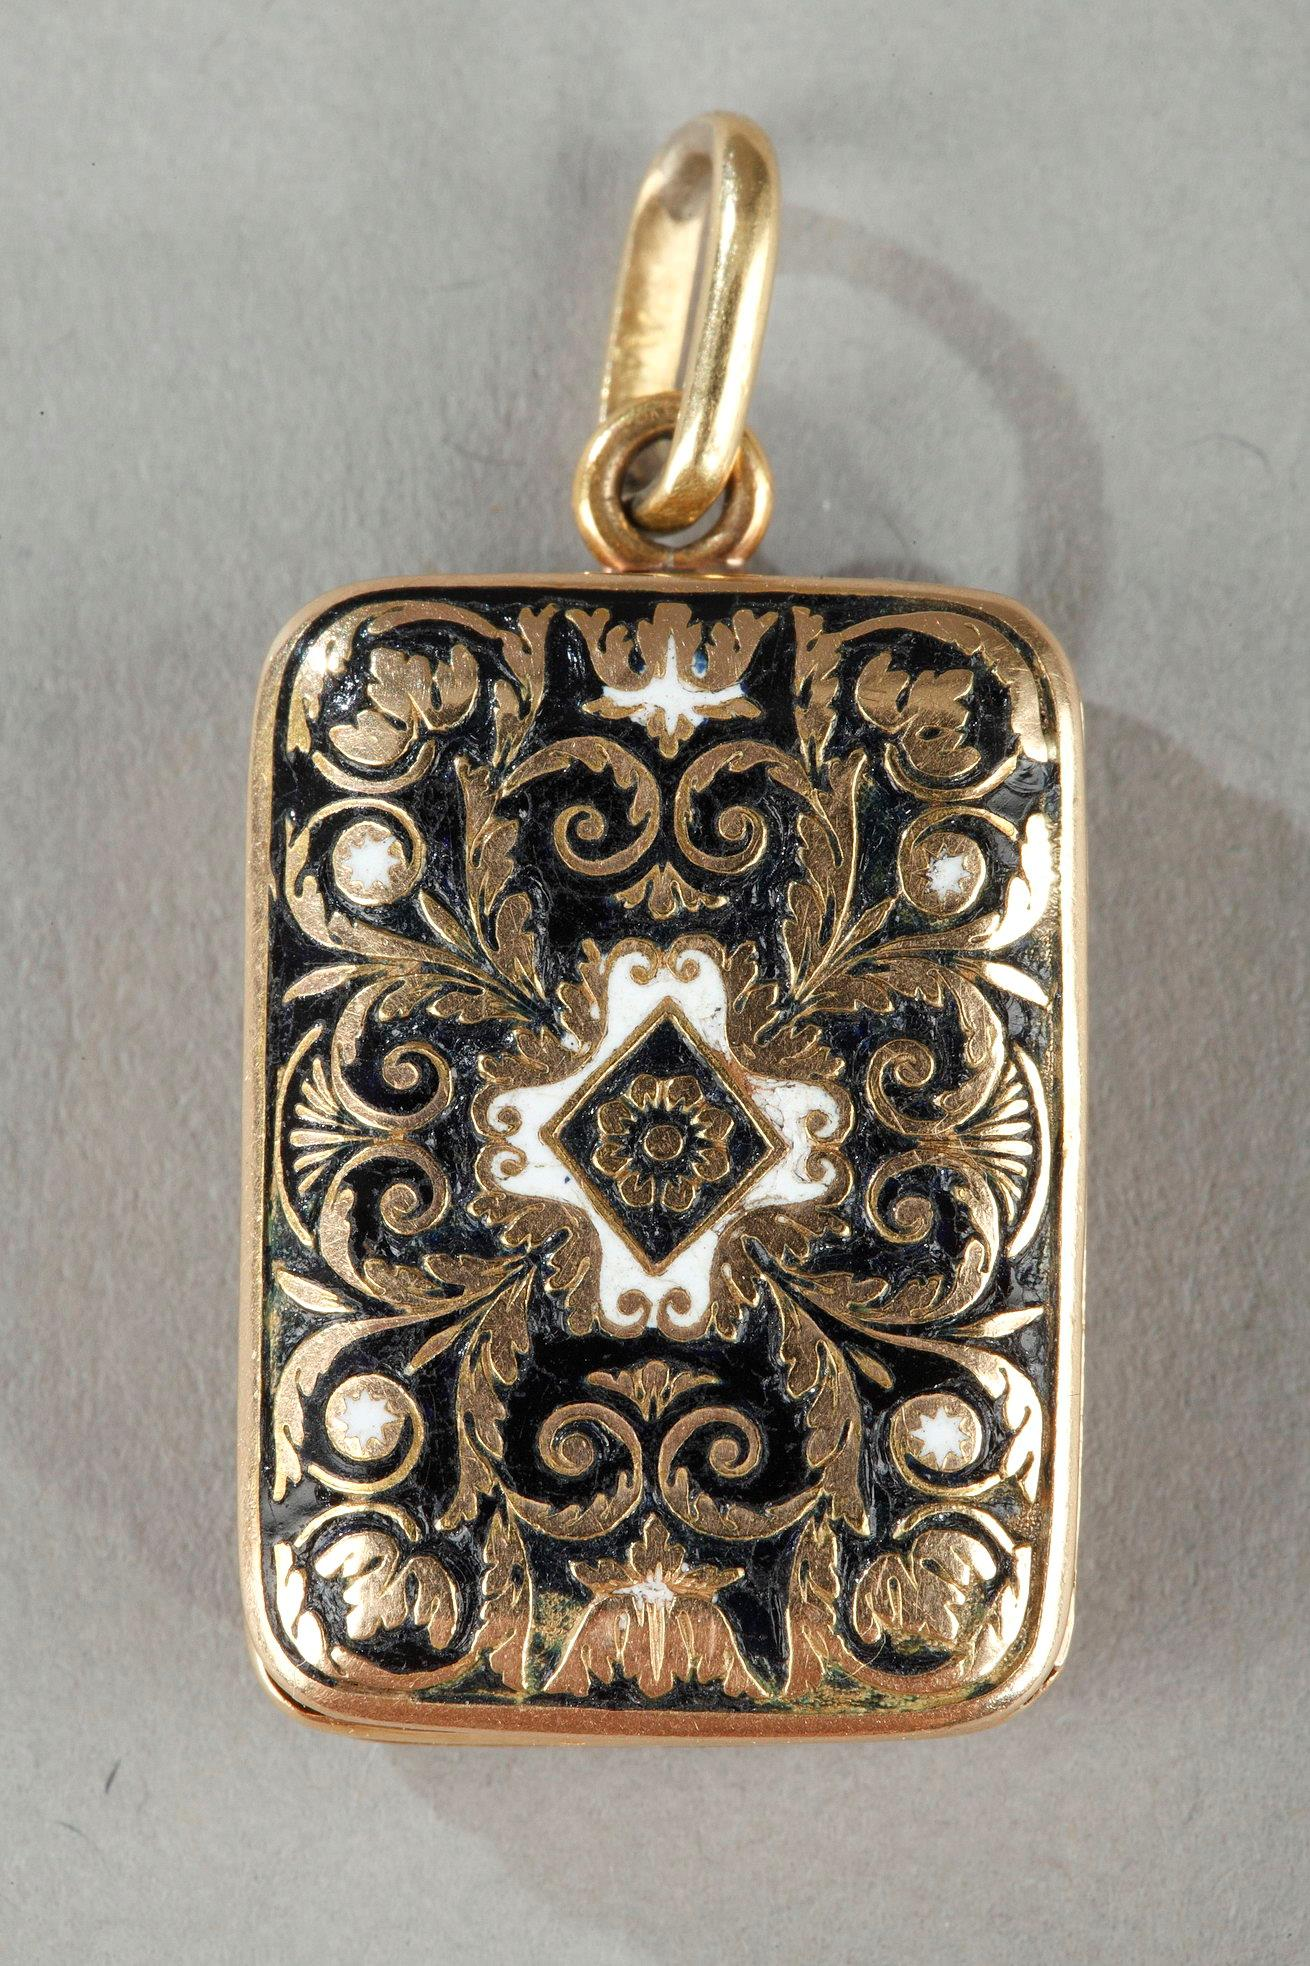 Enameled gold vinaigrette.  Early 19th century. Circa 1820-1830.